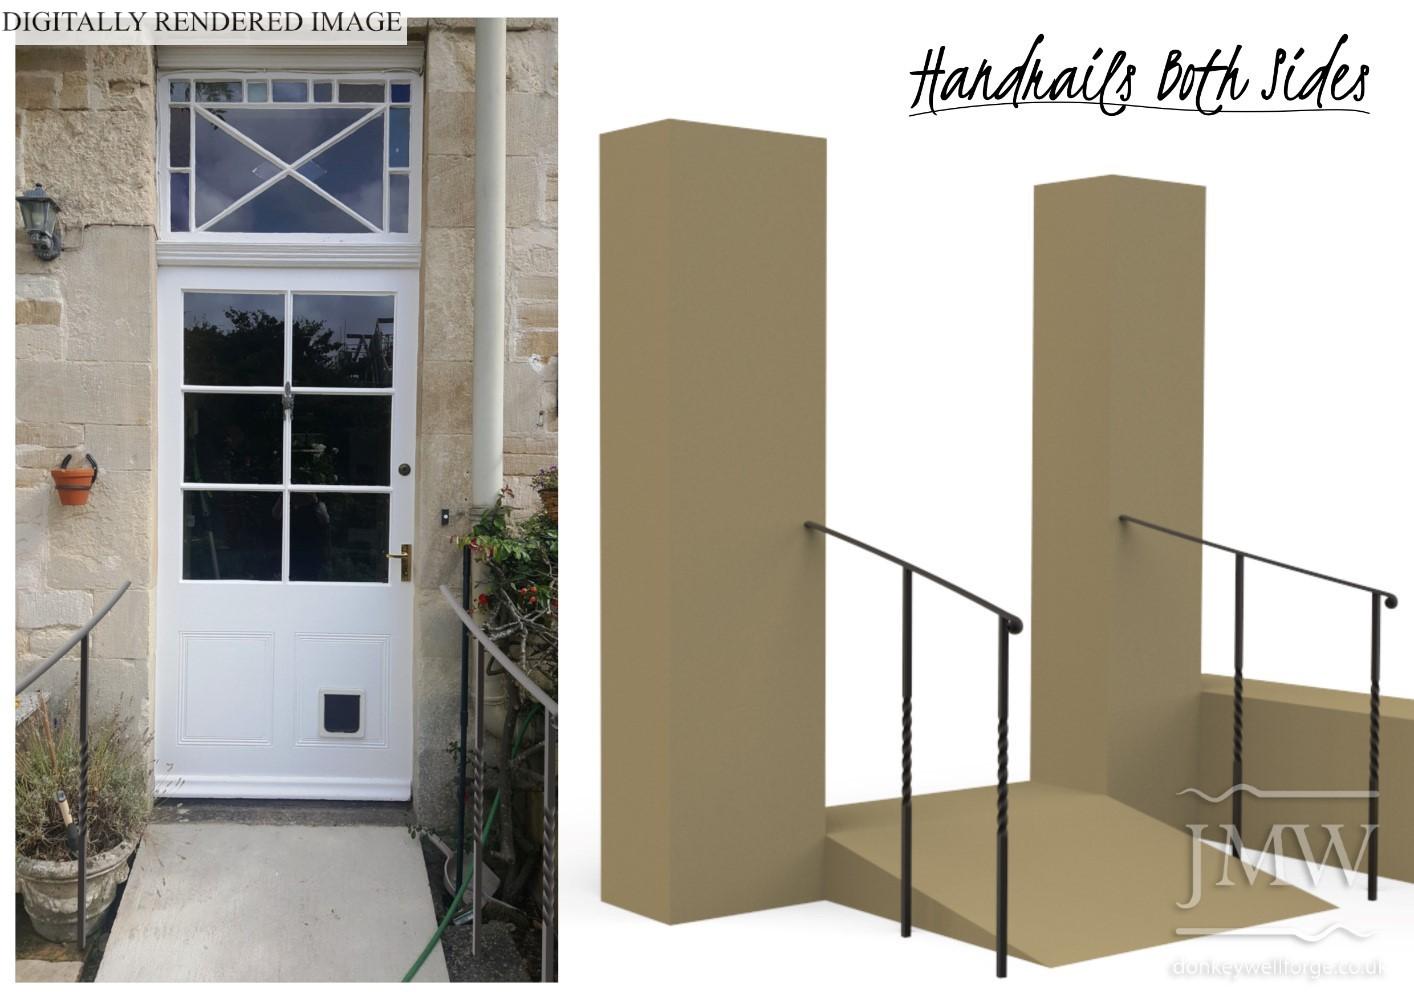 digitally-rendered-handrails-metalwork-architectural